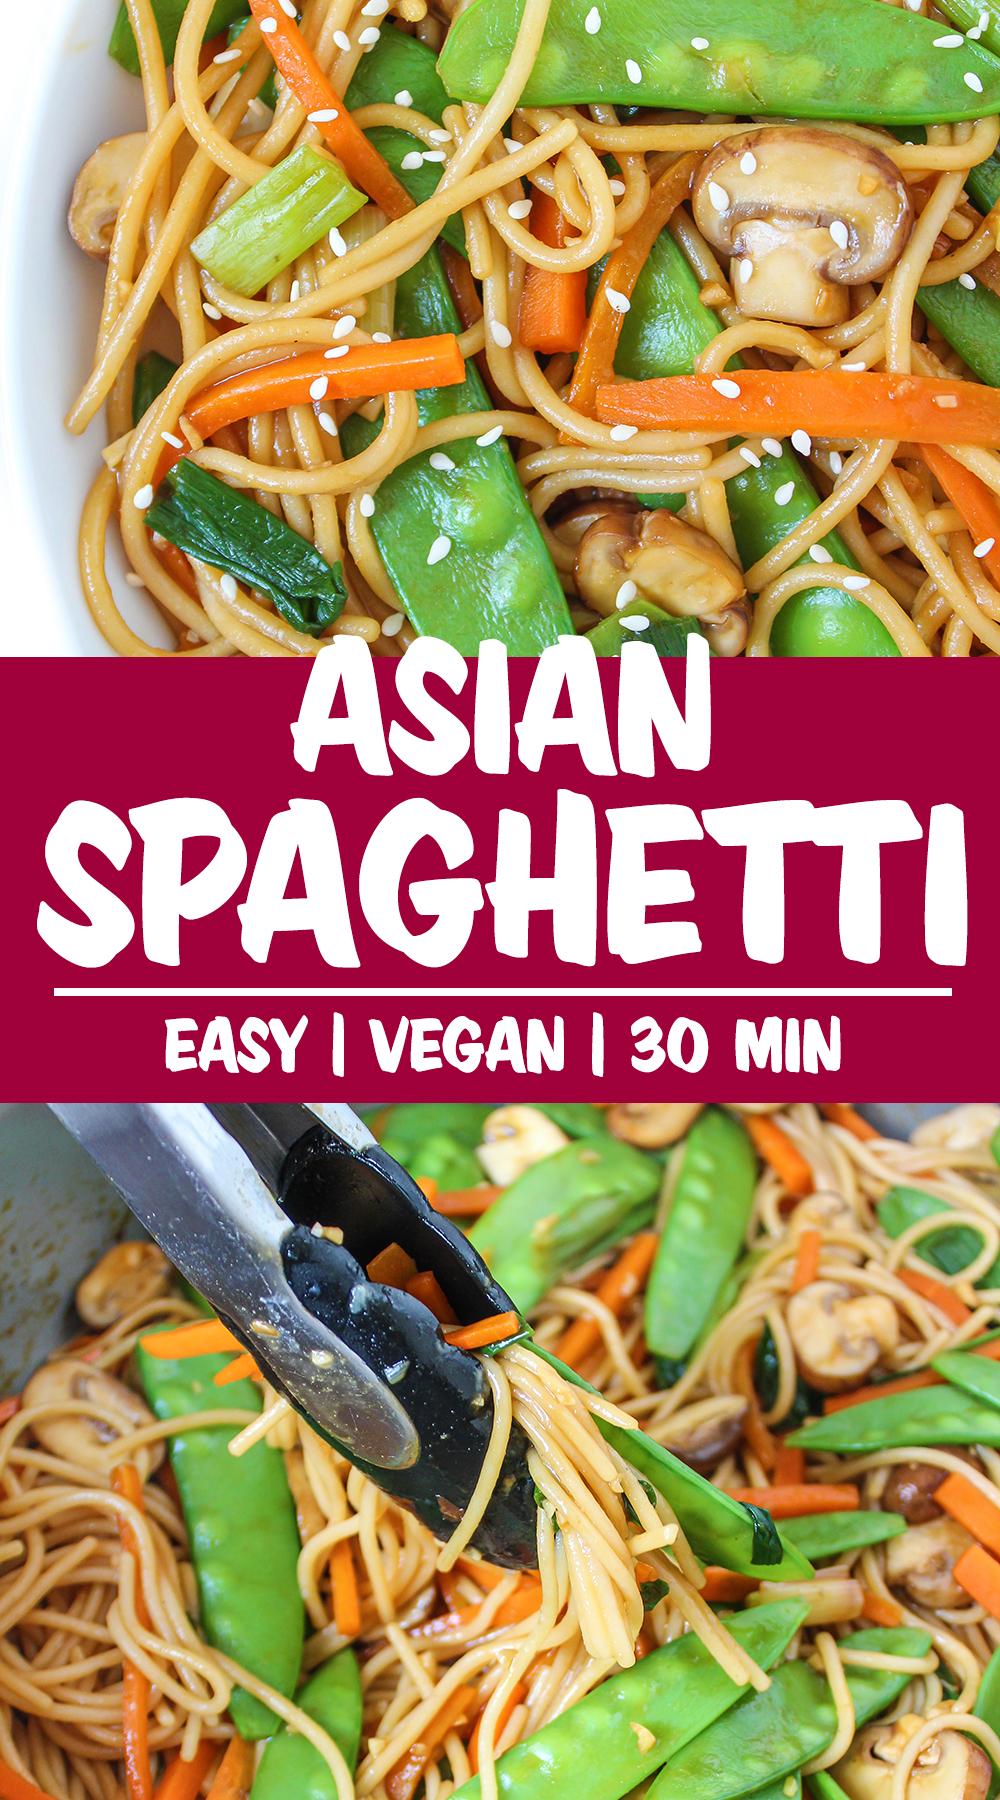 Vegan Asian-inspired spaghetti photo collage